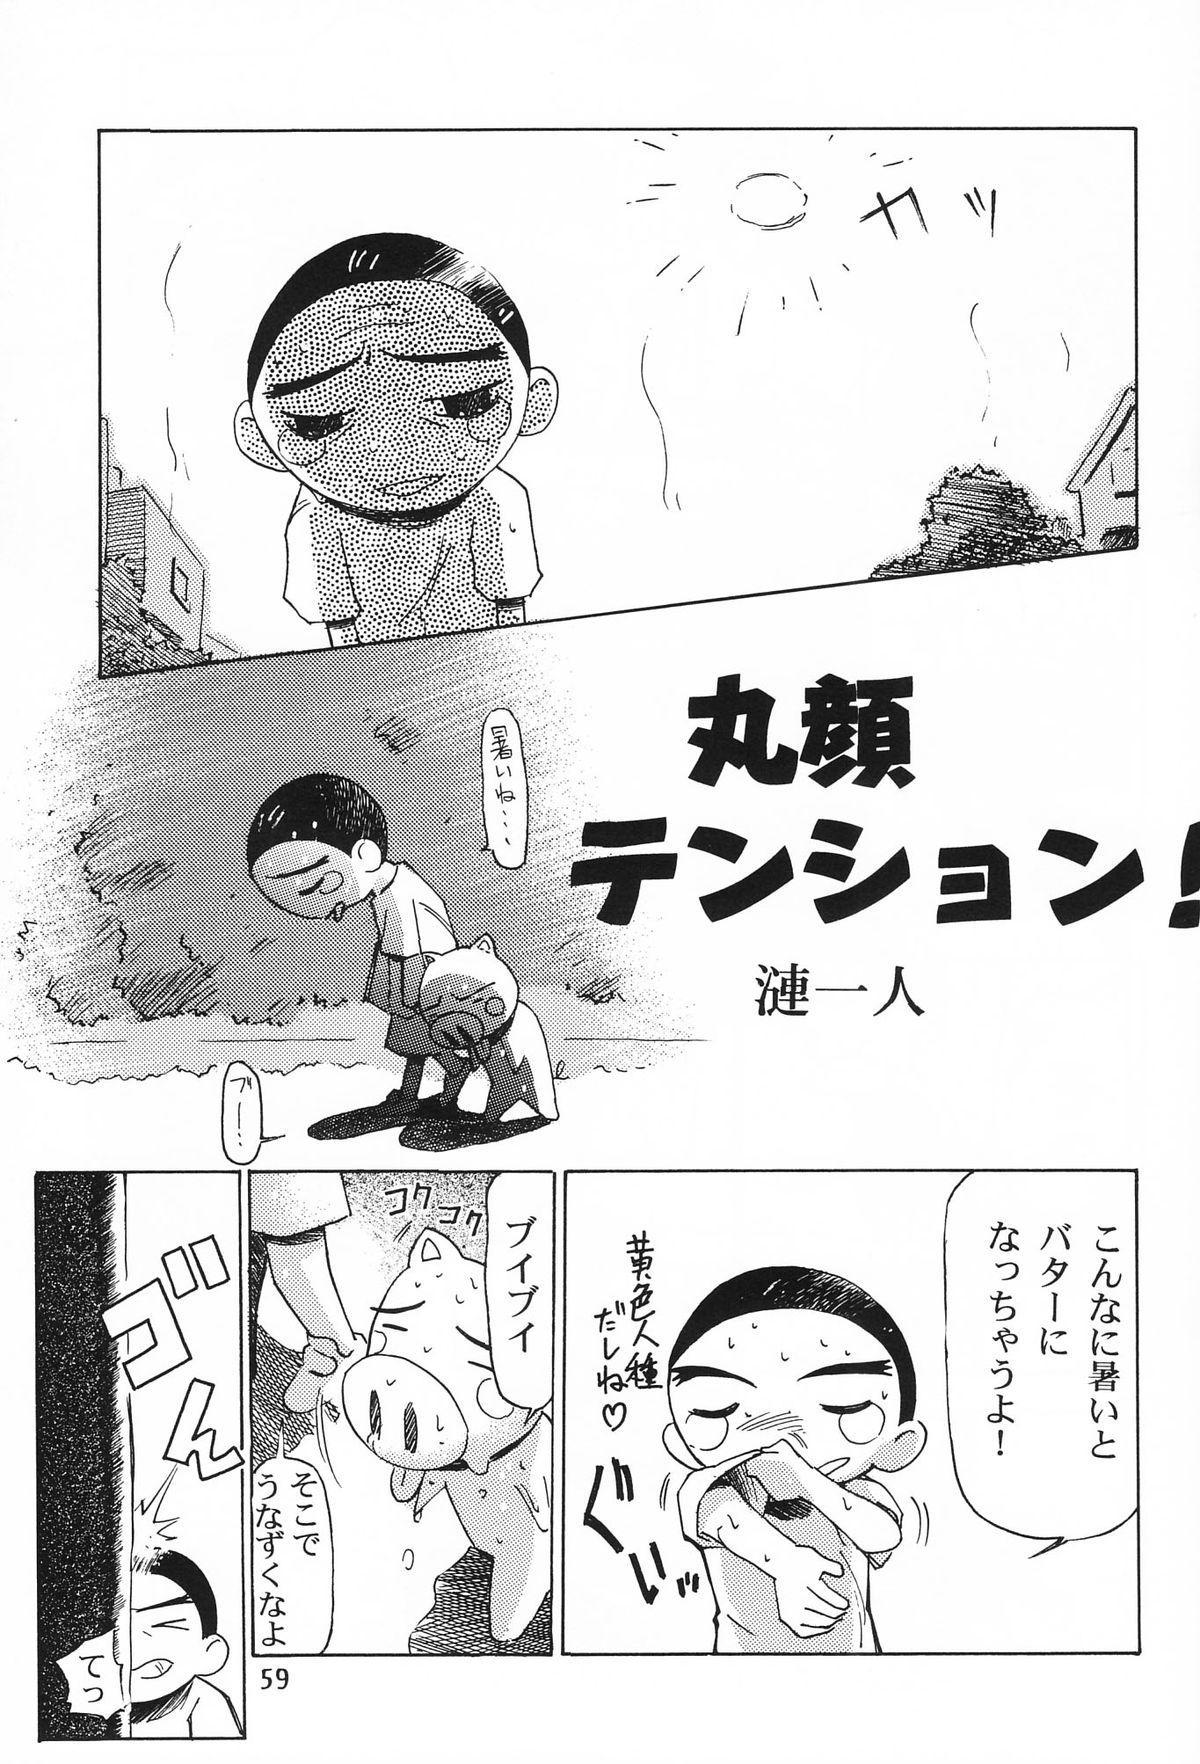 Henrei-kai '98 Natsu SPECIAL 58